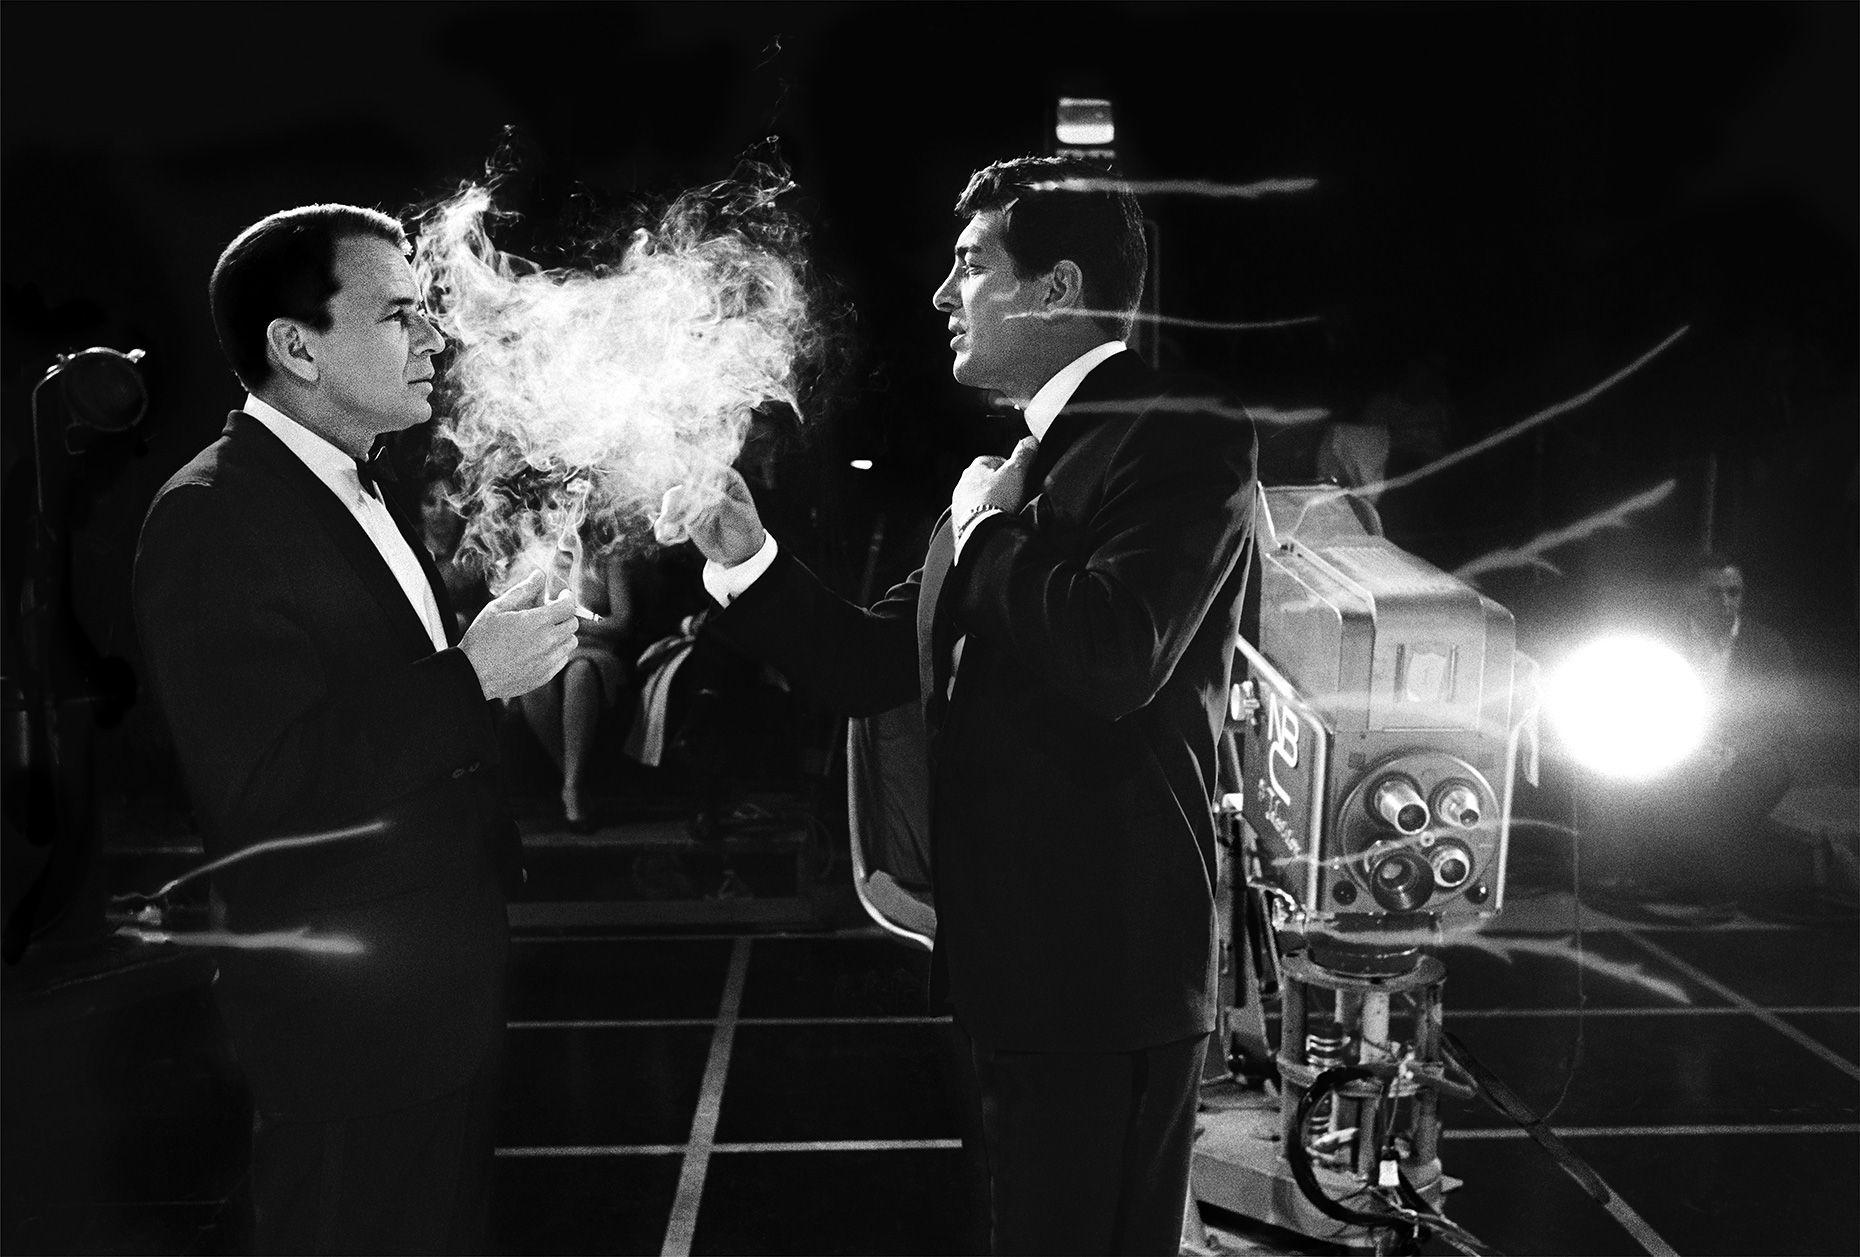 http://www.willoughbyphotos.com/media/original/Frank-Sinatra_Dean-Martin-Smoke-copy1.jpg